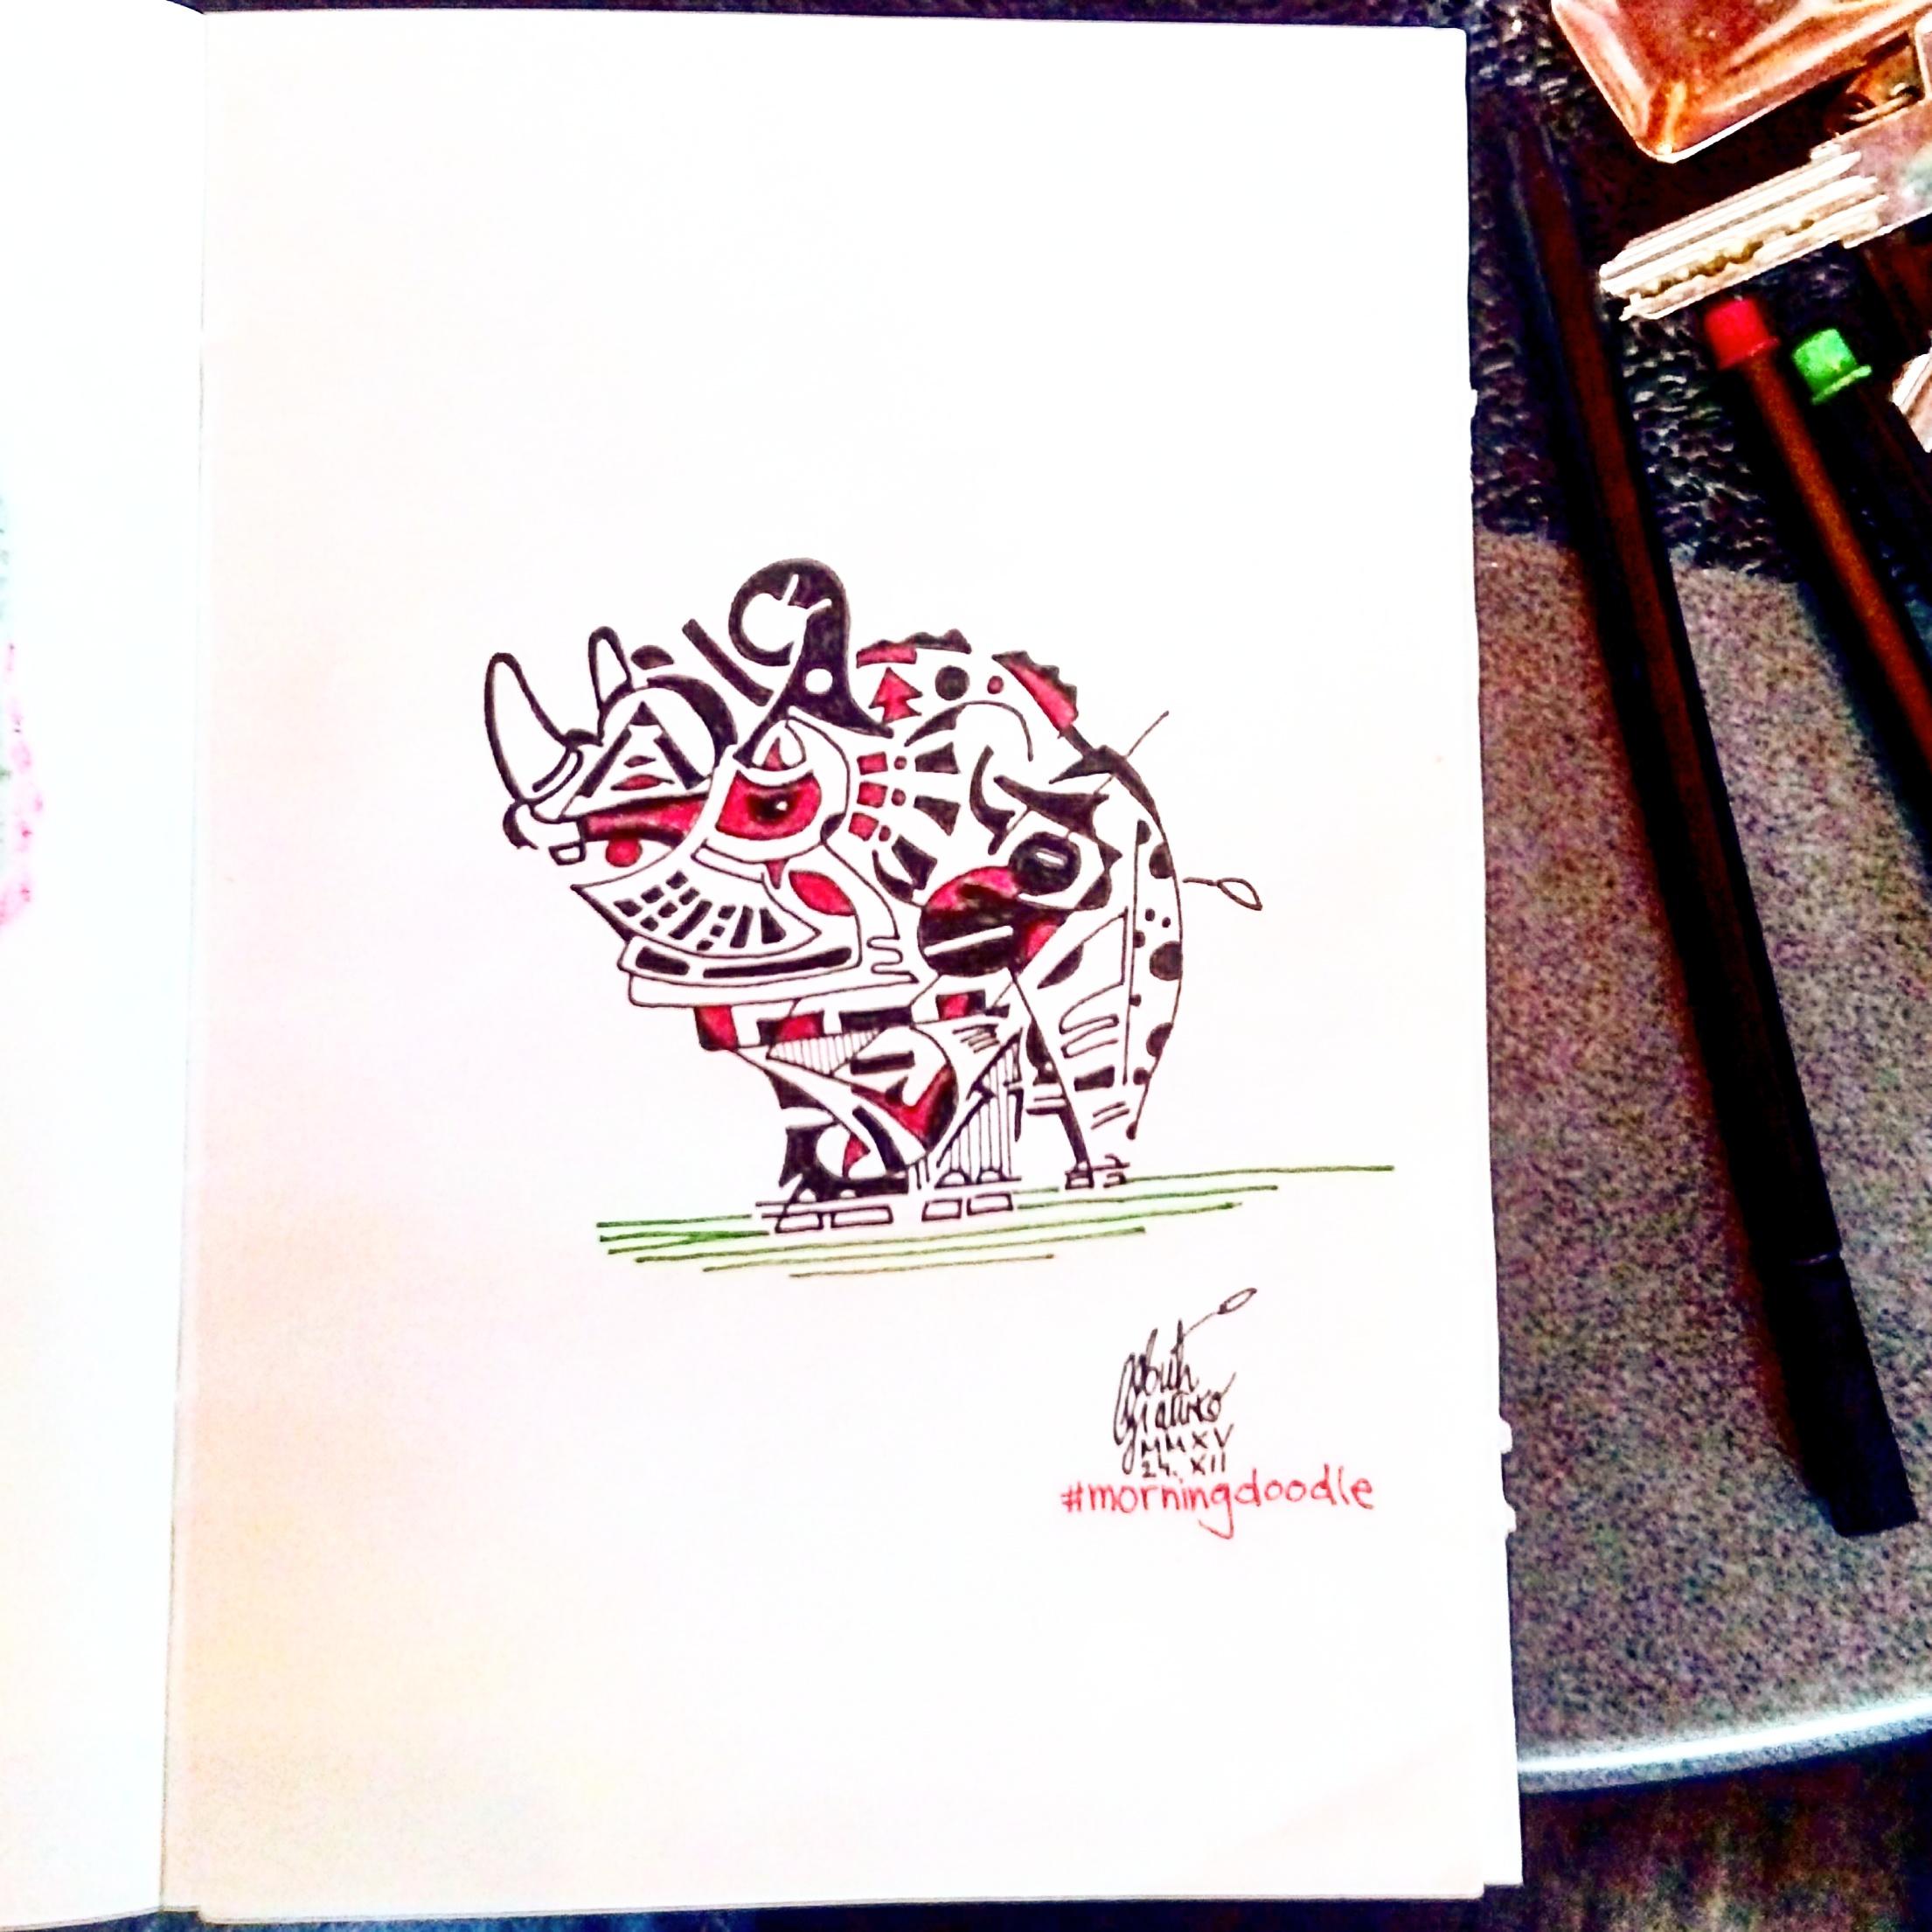 Morning doodle - 24. XII '15. - Rhyno by zlajonja